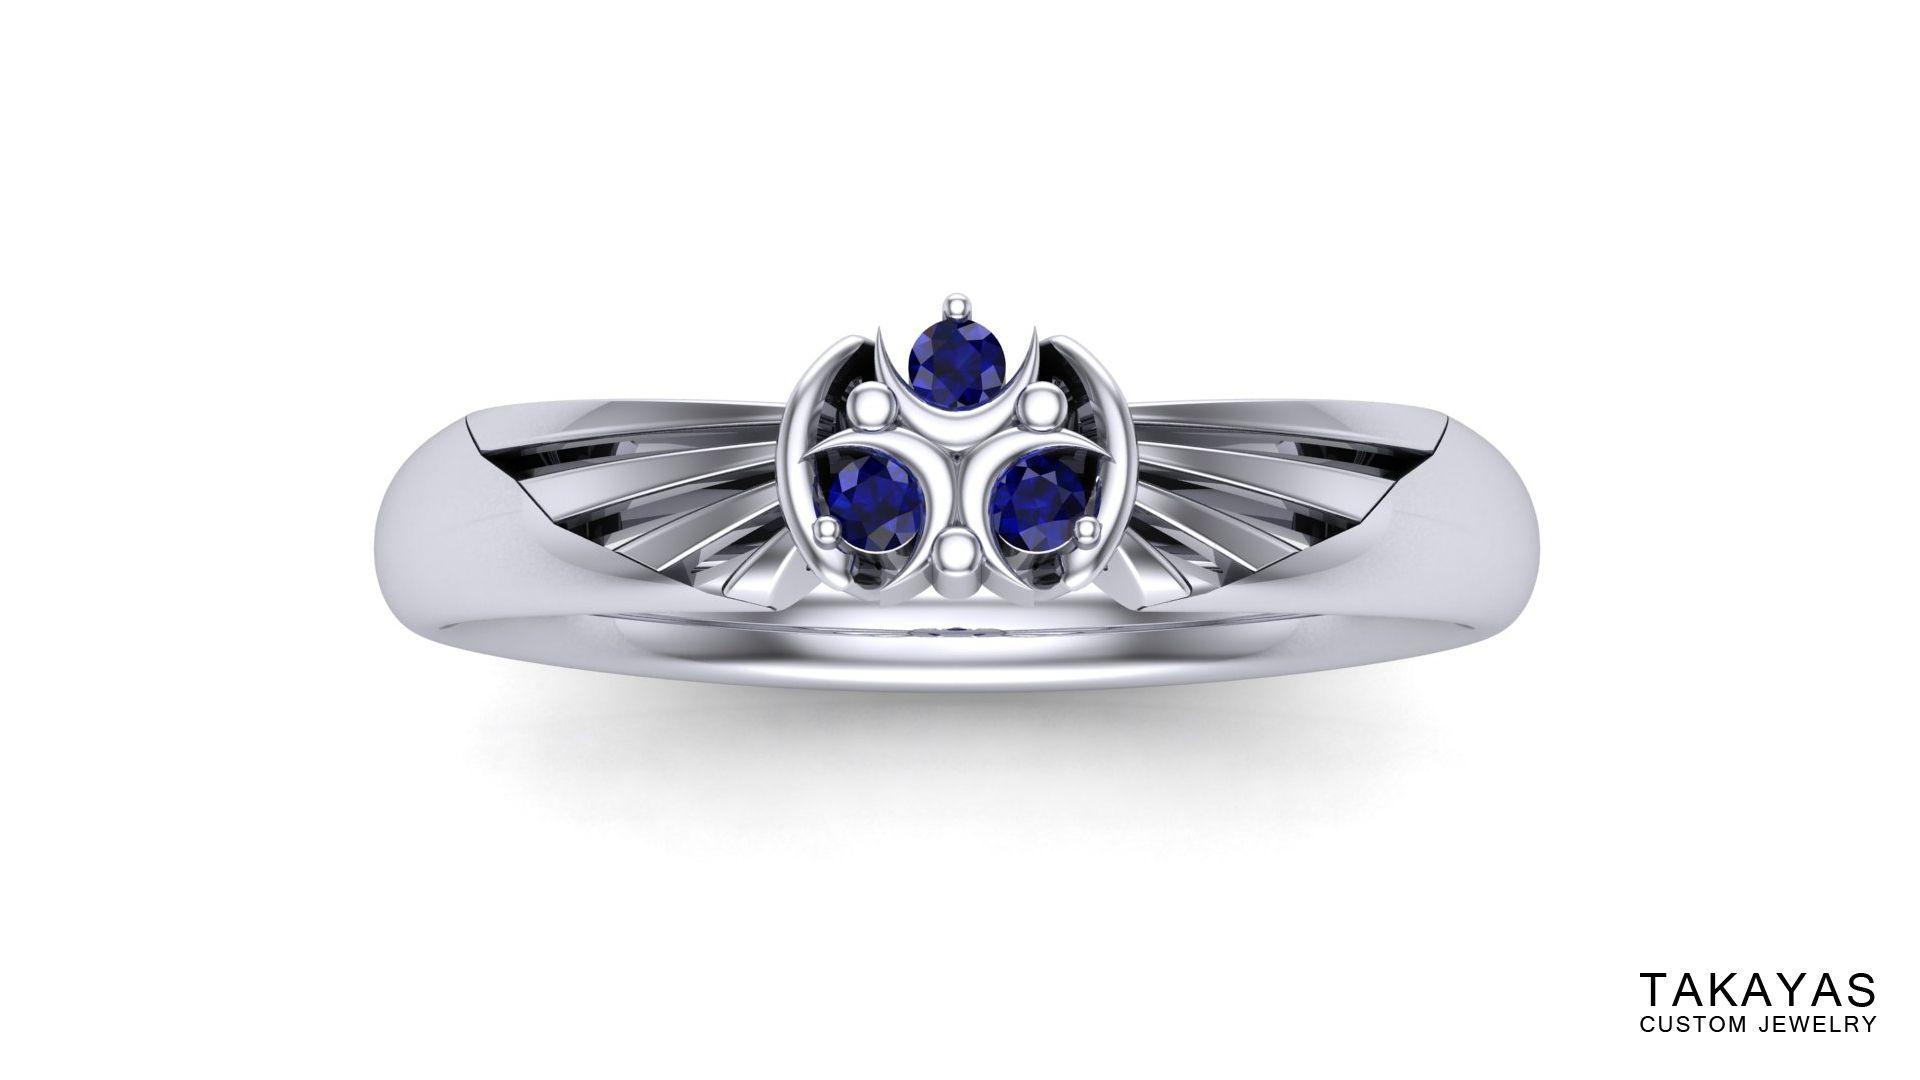 Legend Of Zelda Spiritual Stones Ring Collection Takayas Custom Jewelry: Spiritual Stones Zelda Wedding Rings At Websimilar.org